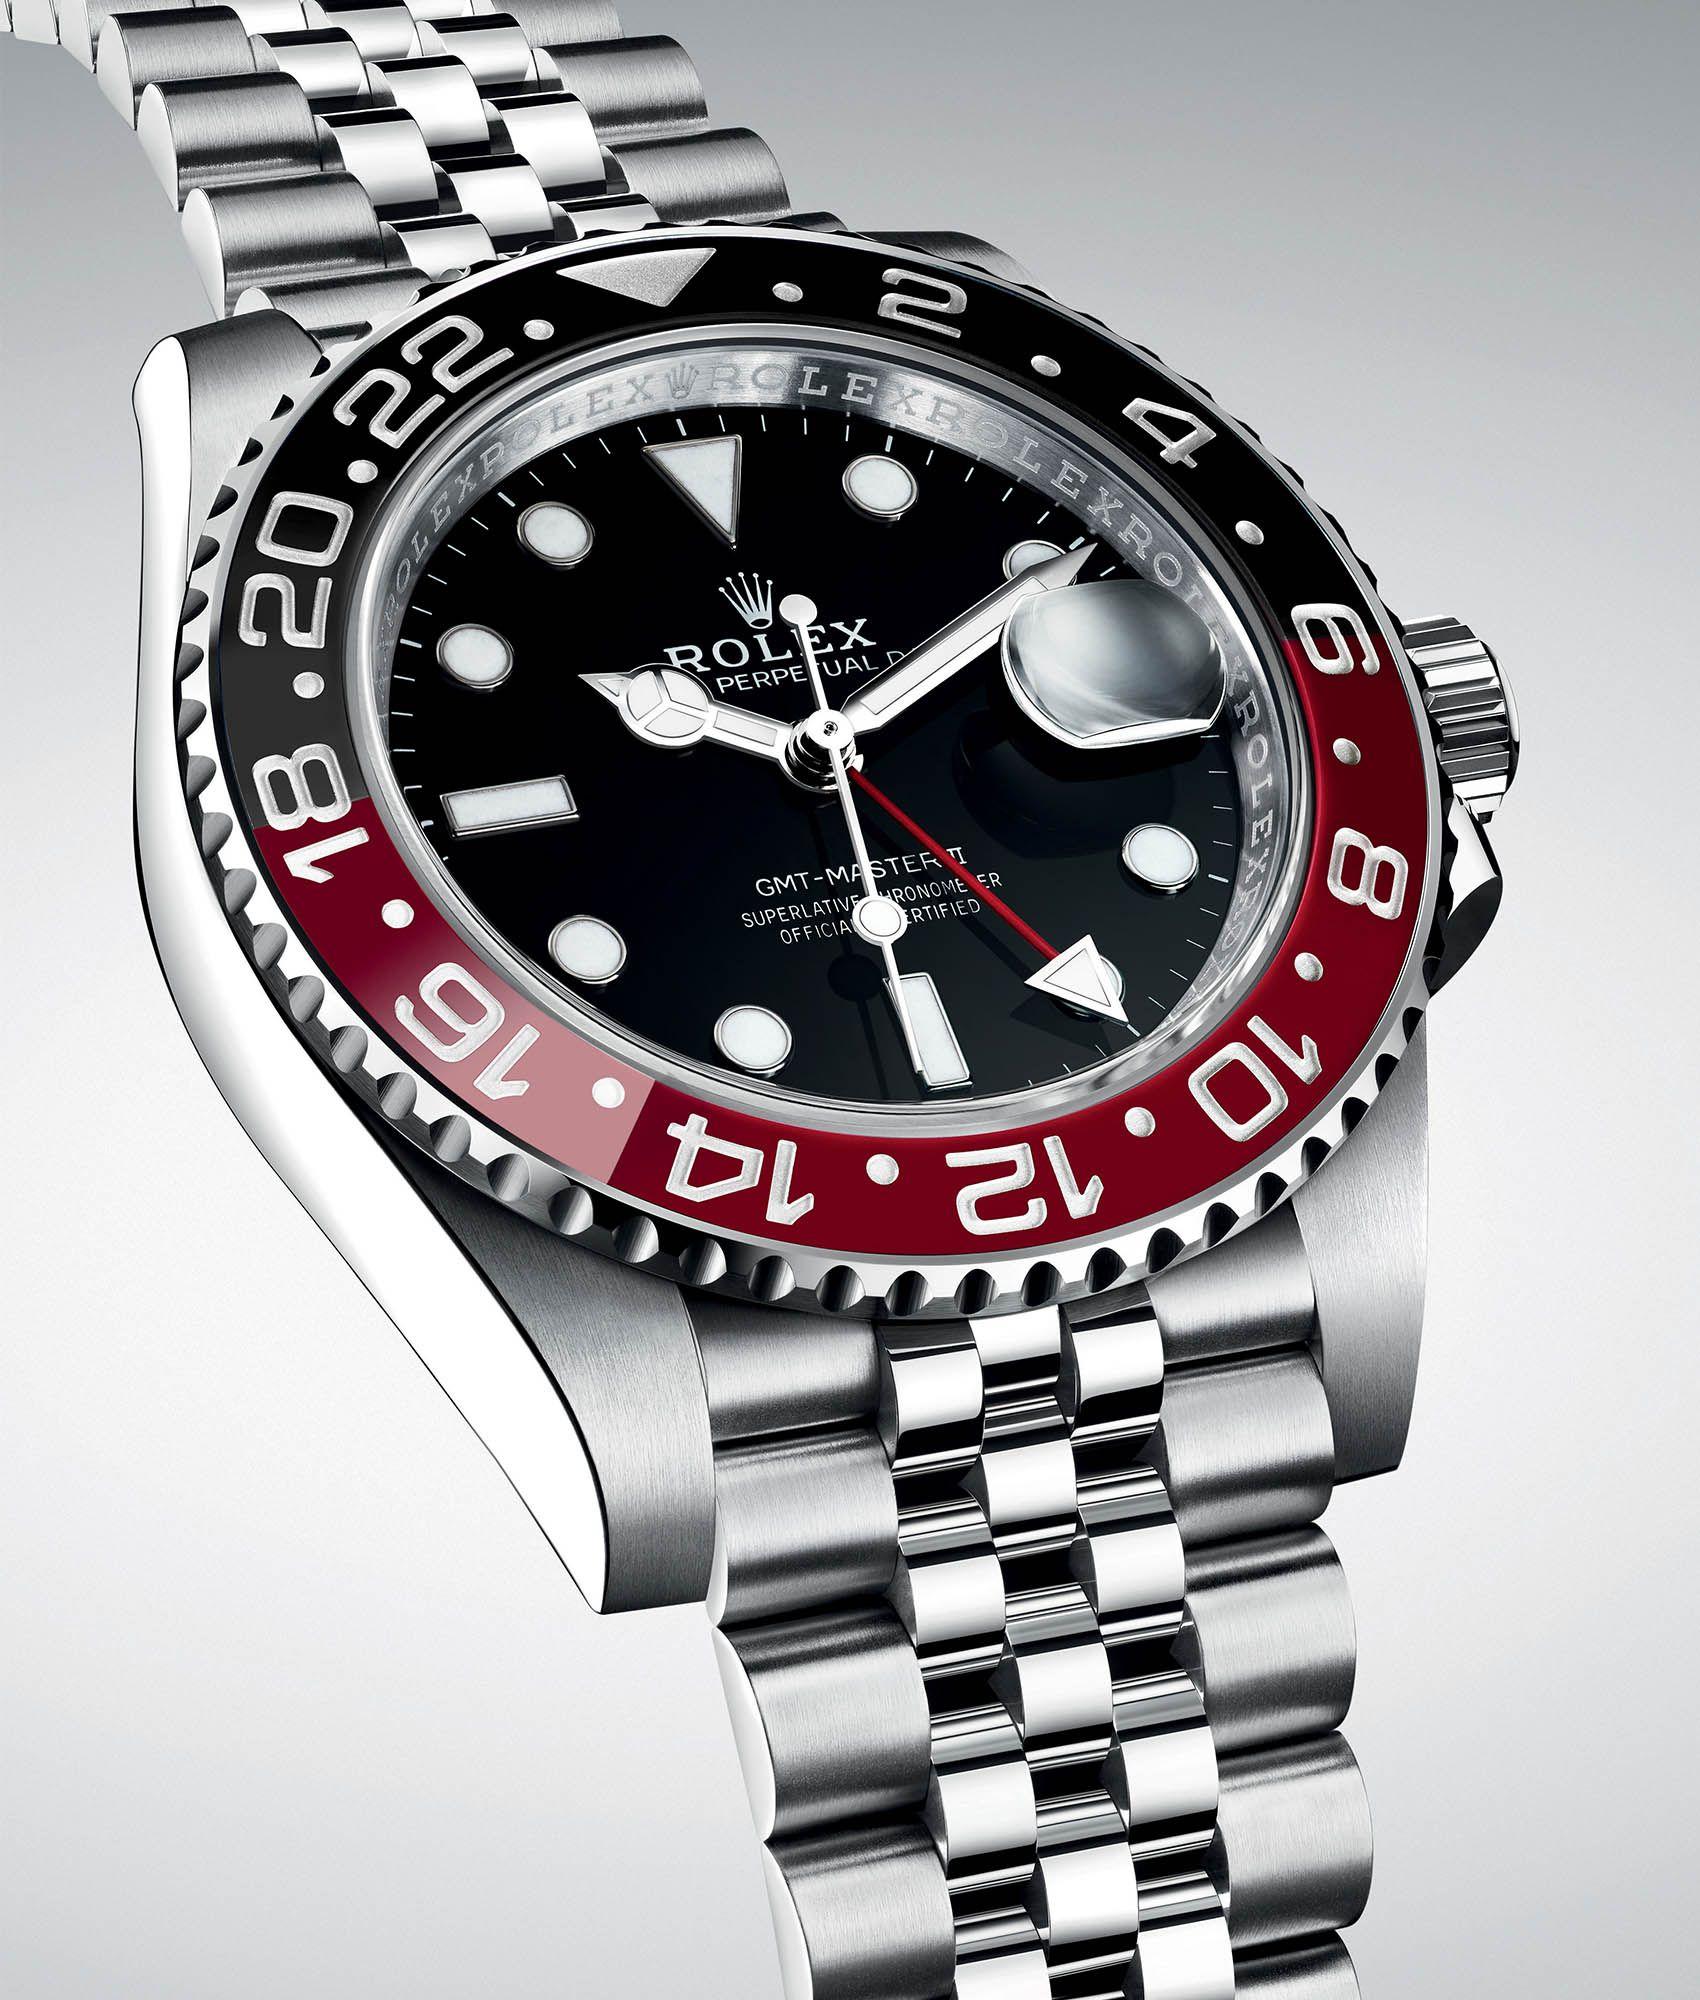 Rolex Baselworld 2019 Rolex Predictions 2019 Rolex Novelties 2019 Rolex Gmt Master Rolex Gmt Master Ii Rolex Watches